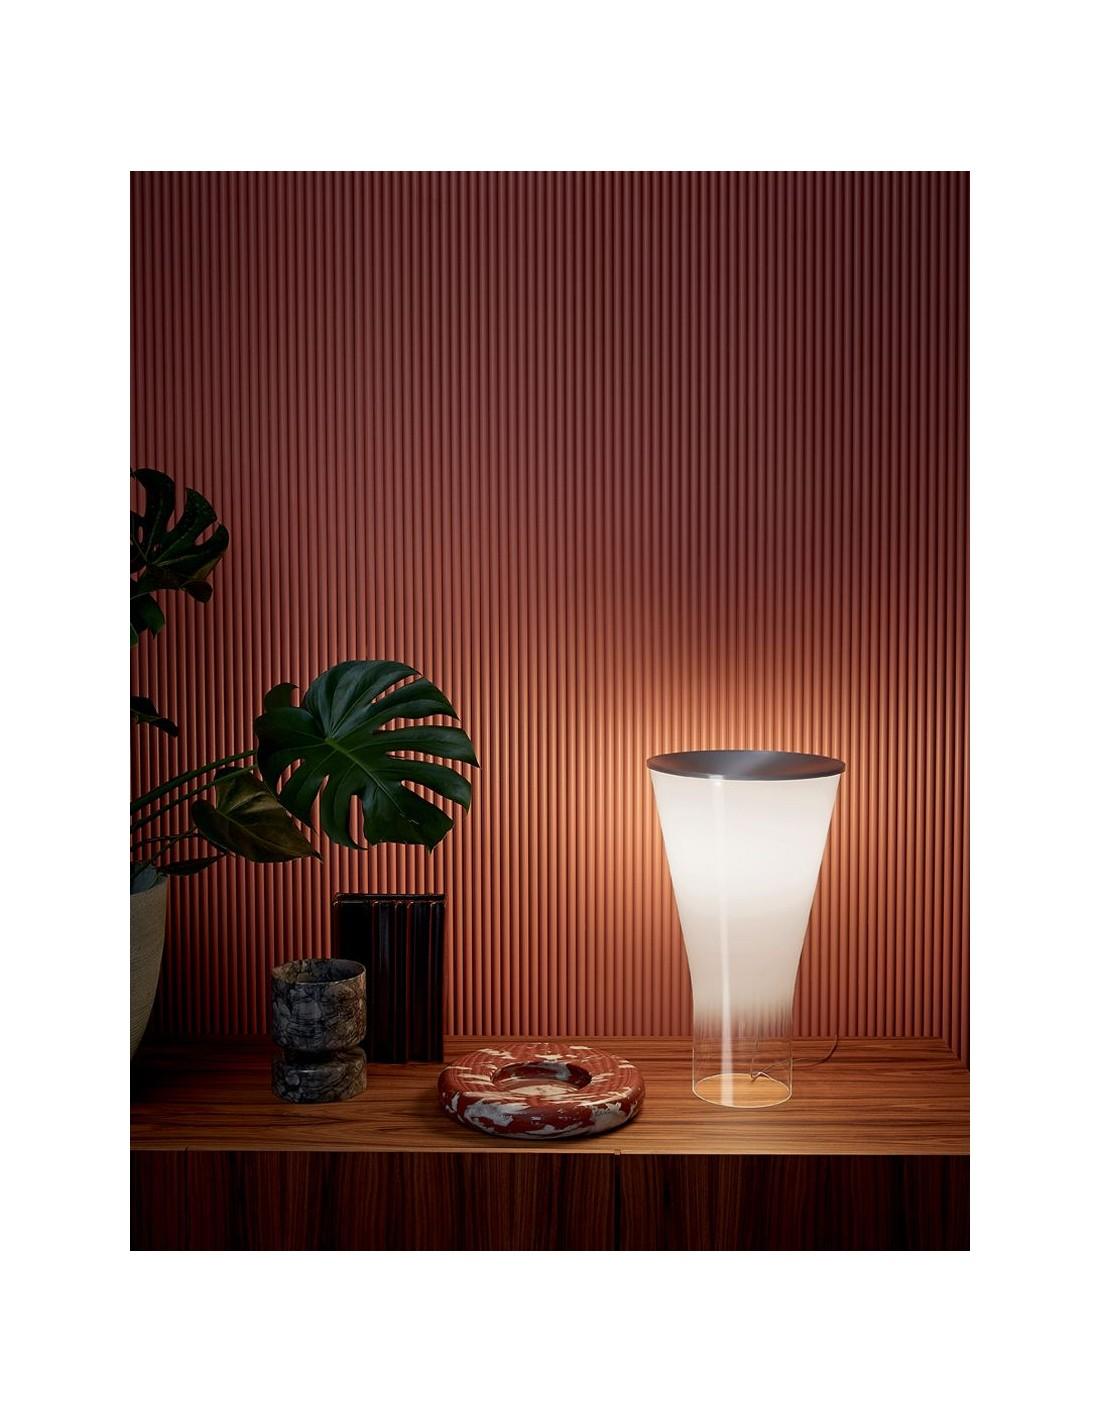 Lampe de table Soffio en verer soufflé - Foscarini - Valente Design